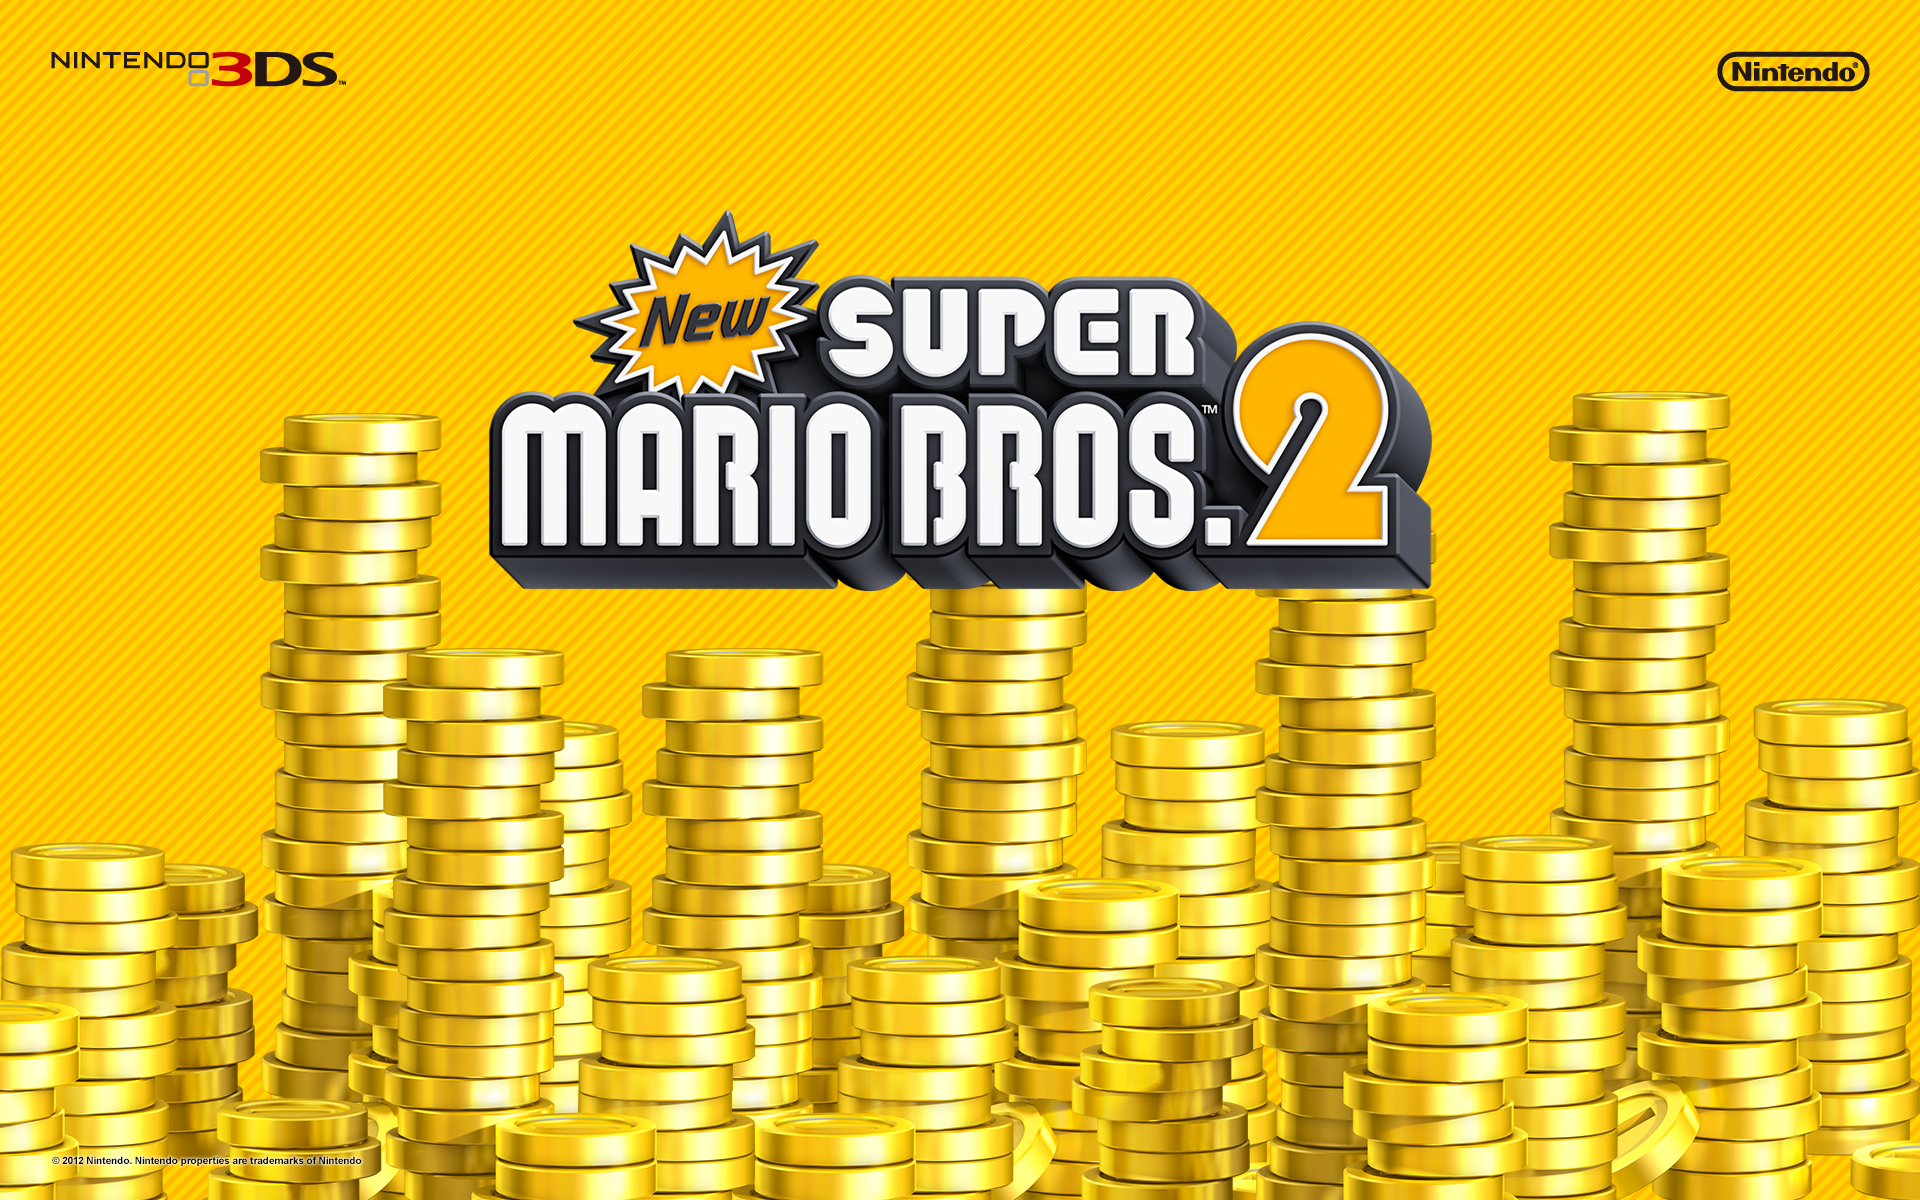 New Super Mario Bros 2 Wallpaper Hd Video Games Blogger